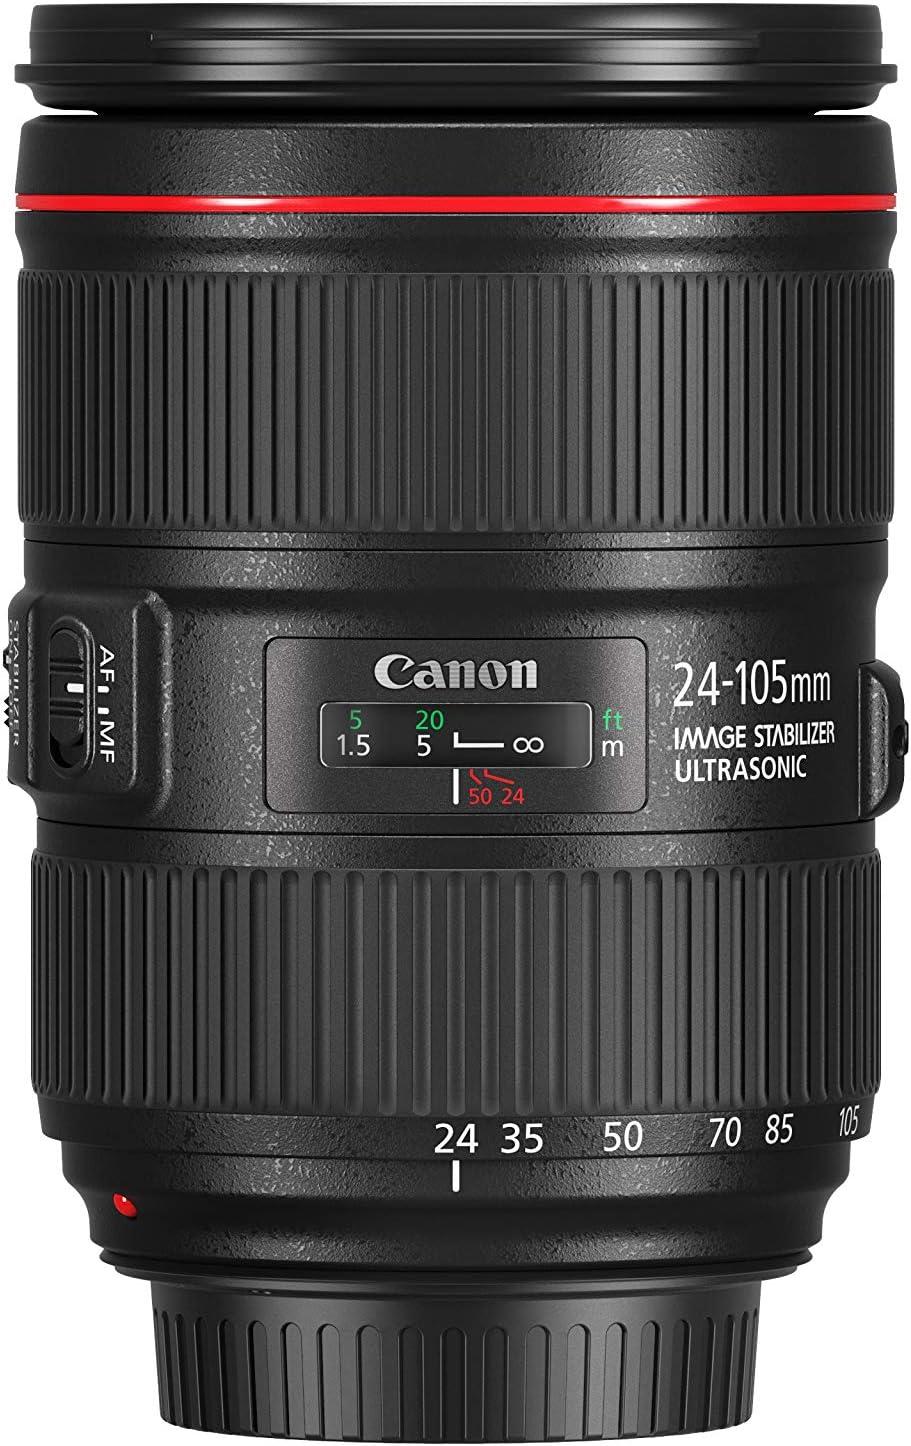 Canon ZOOM LENS EF24-105mm F4L IS II USM - White Box (New) (Bulk Packaging)